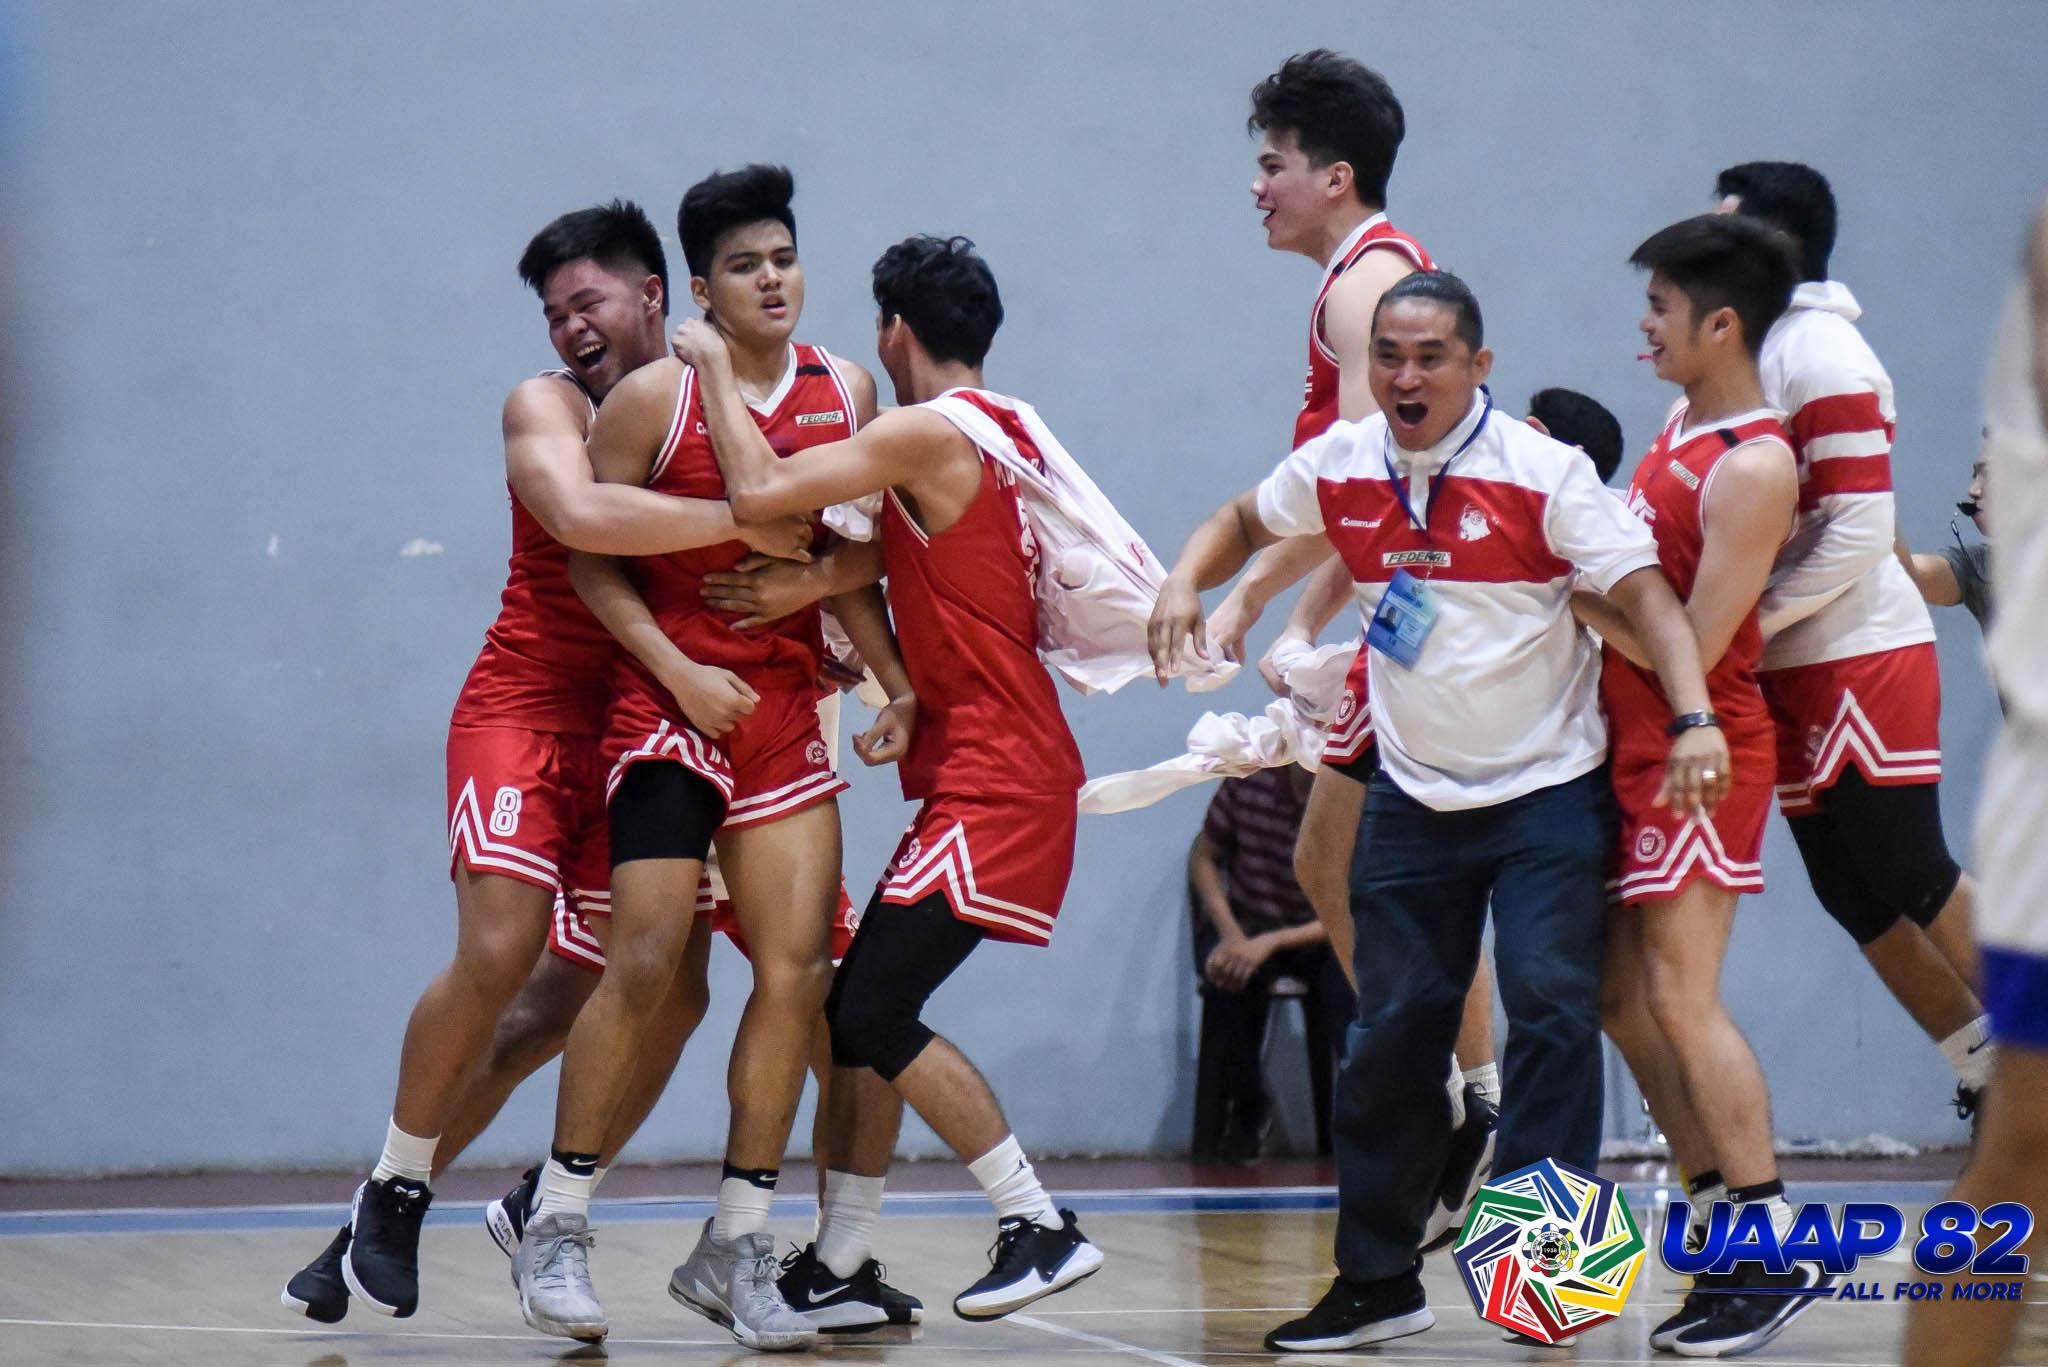 UAAP82-JUNIORS-BASKETBALL-10TH-PHOTO-UE-NAZ-SAN-JUAN NU goes to 4-0 as Naz San Juan lifts UE to stunner over Ateneo Uncategorized  - philippine sports news